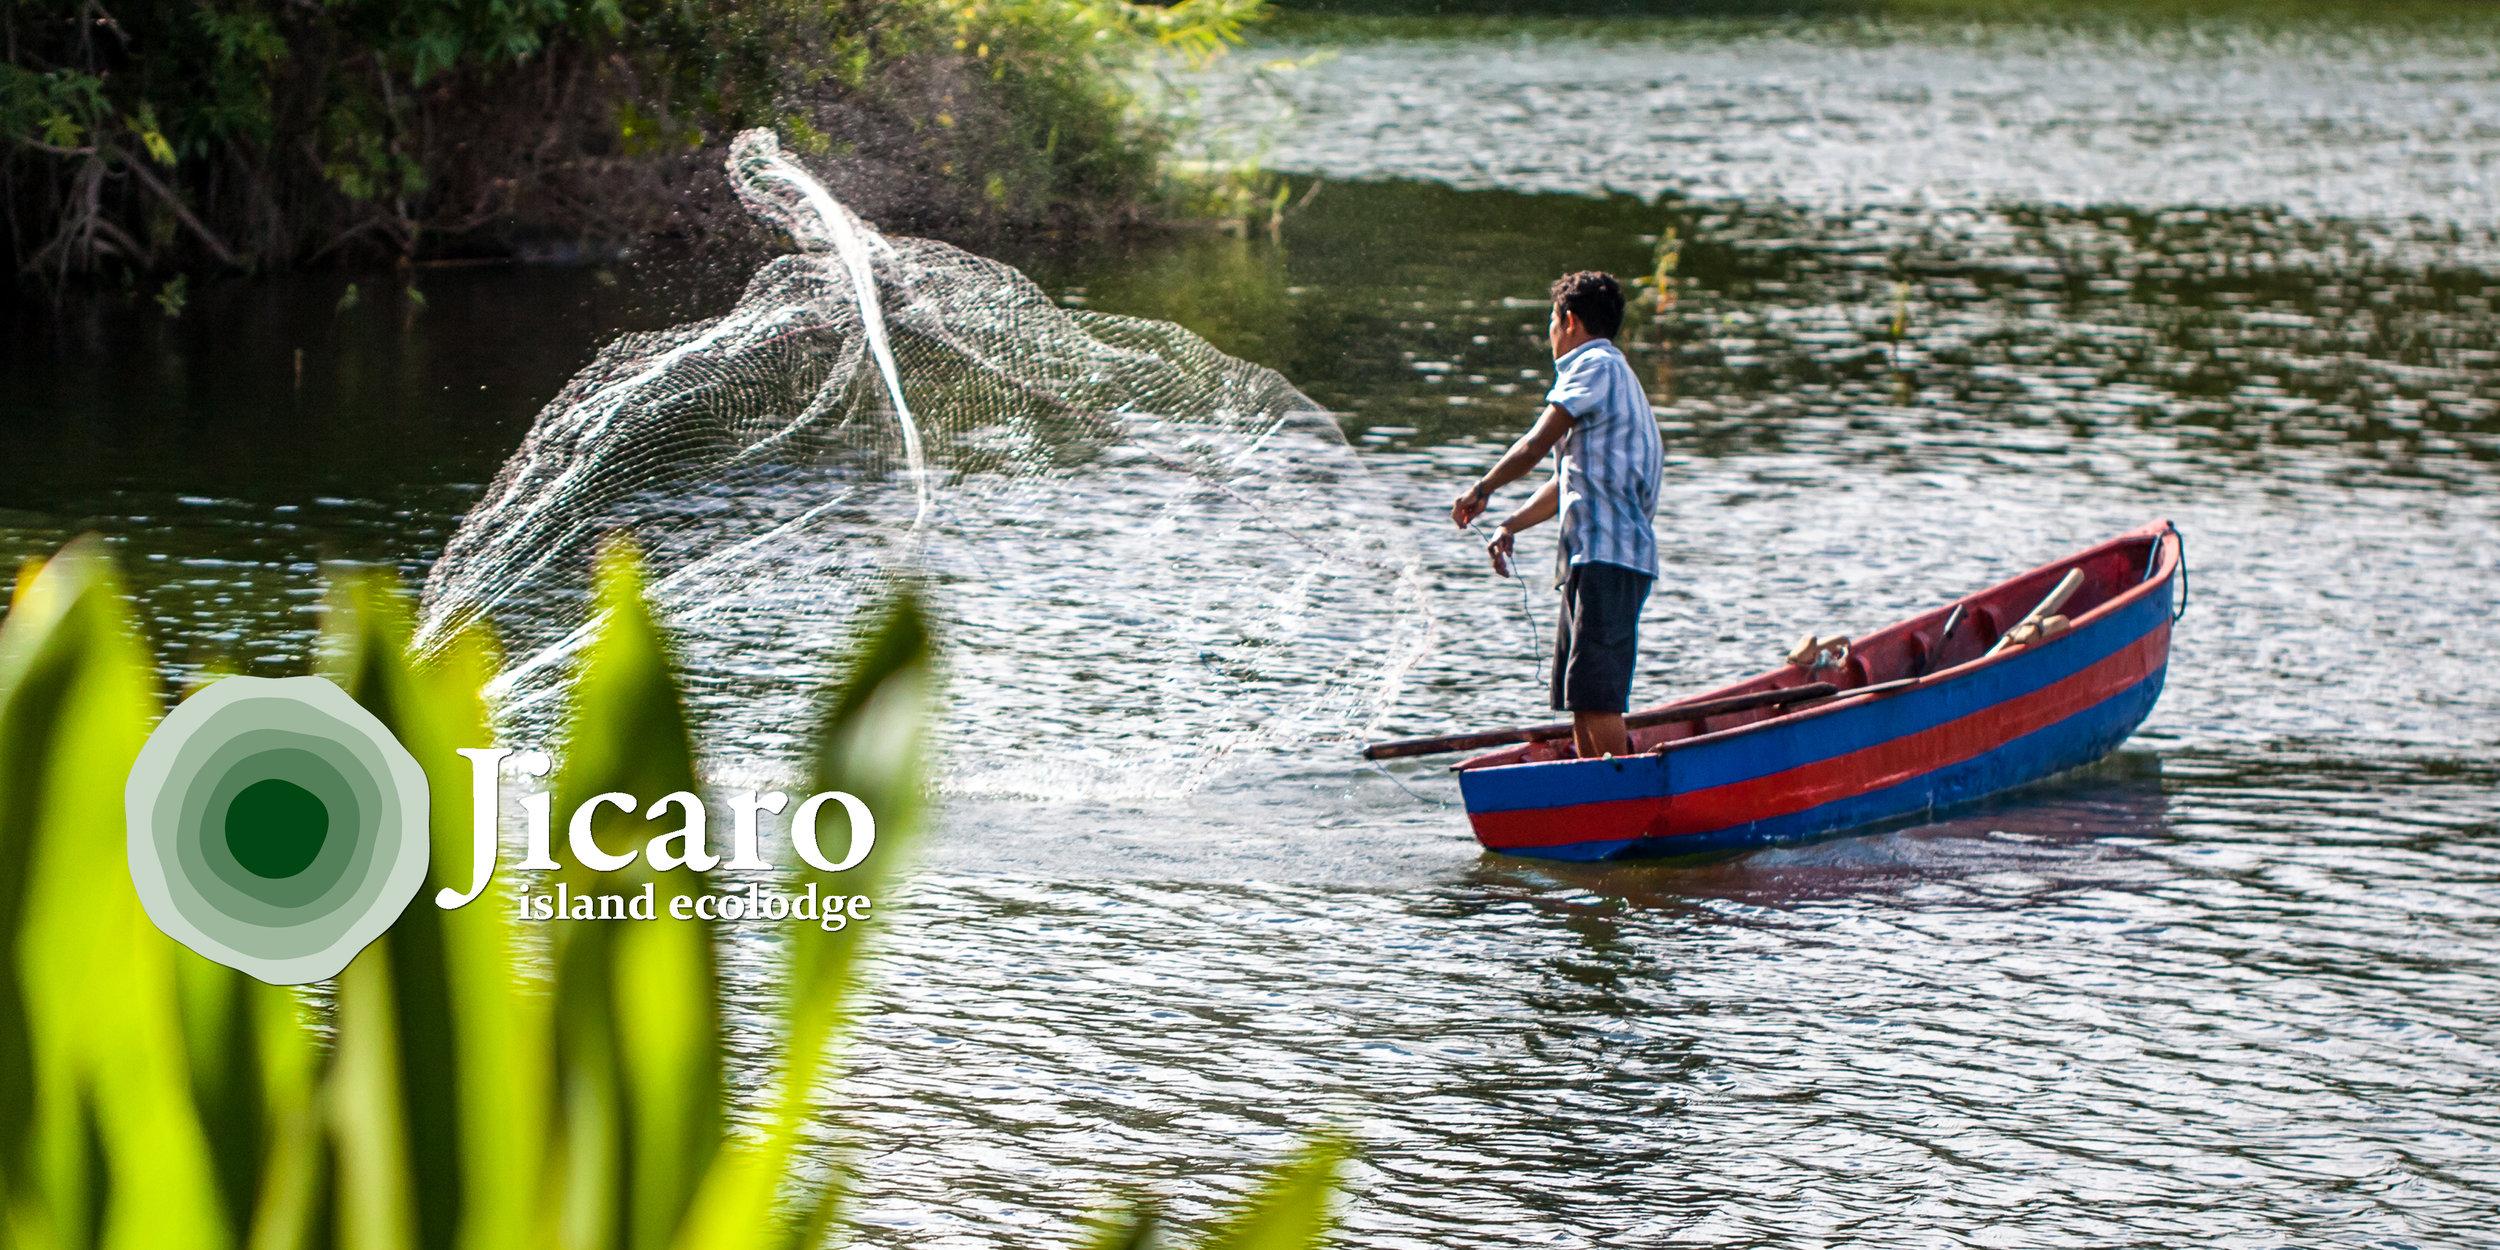 Jicaro Island Web Images 3.jpg